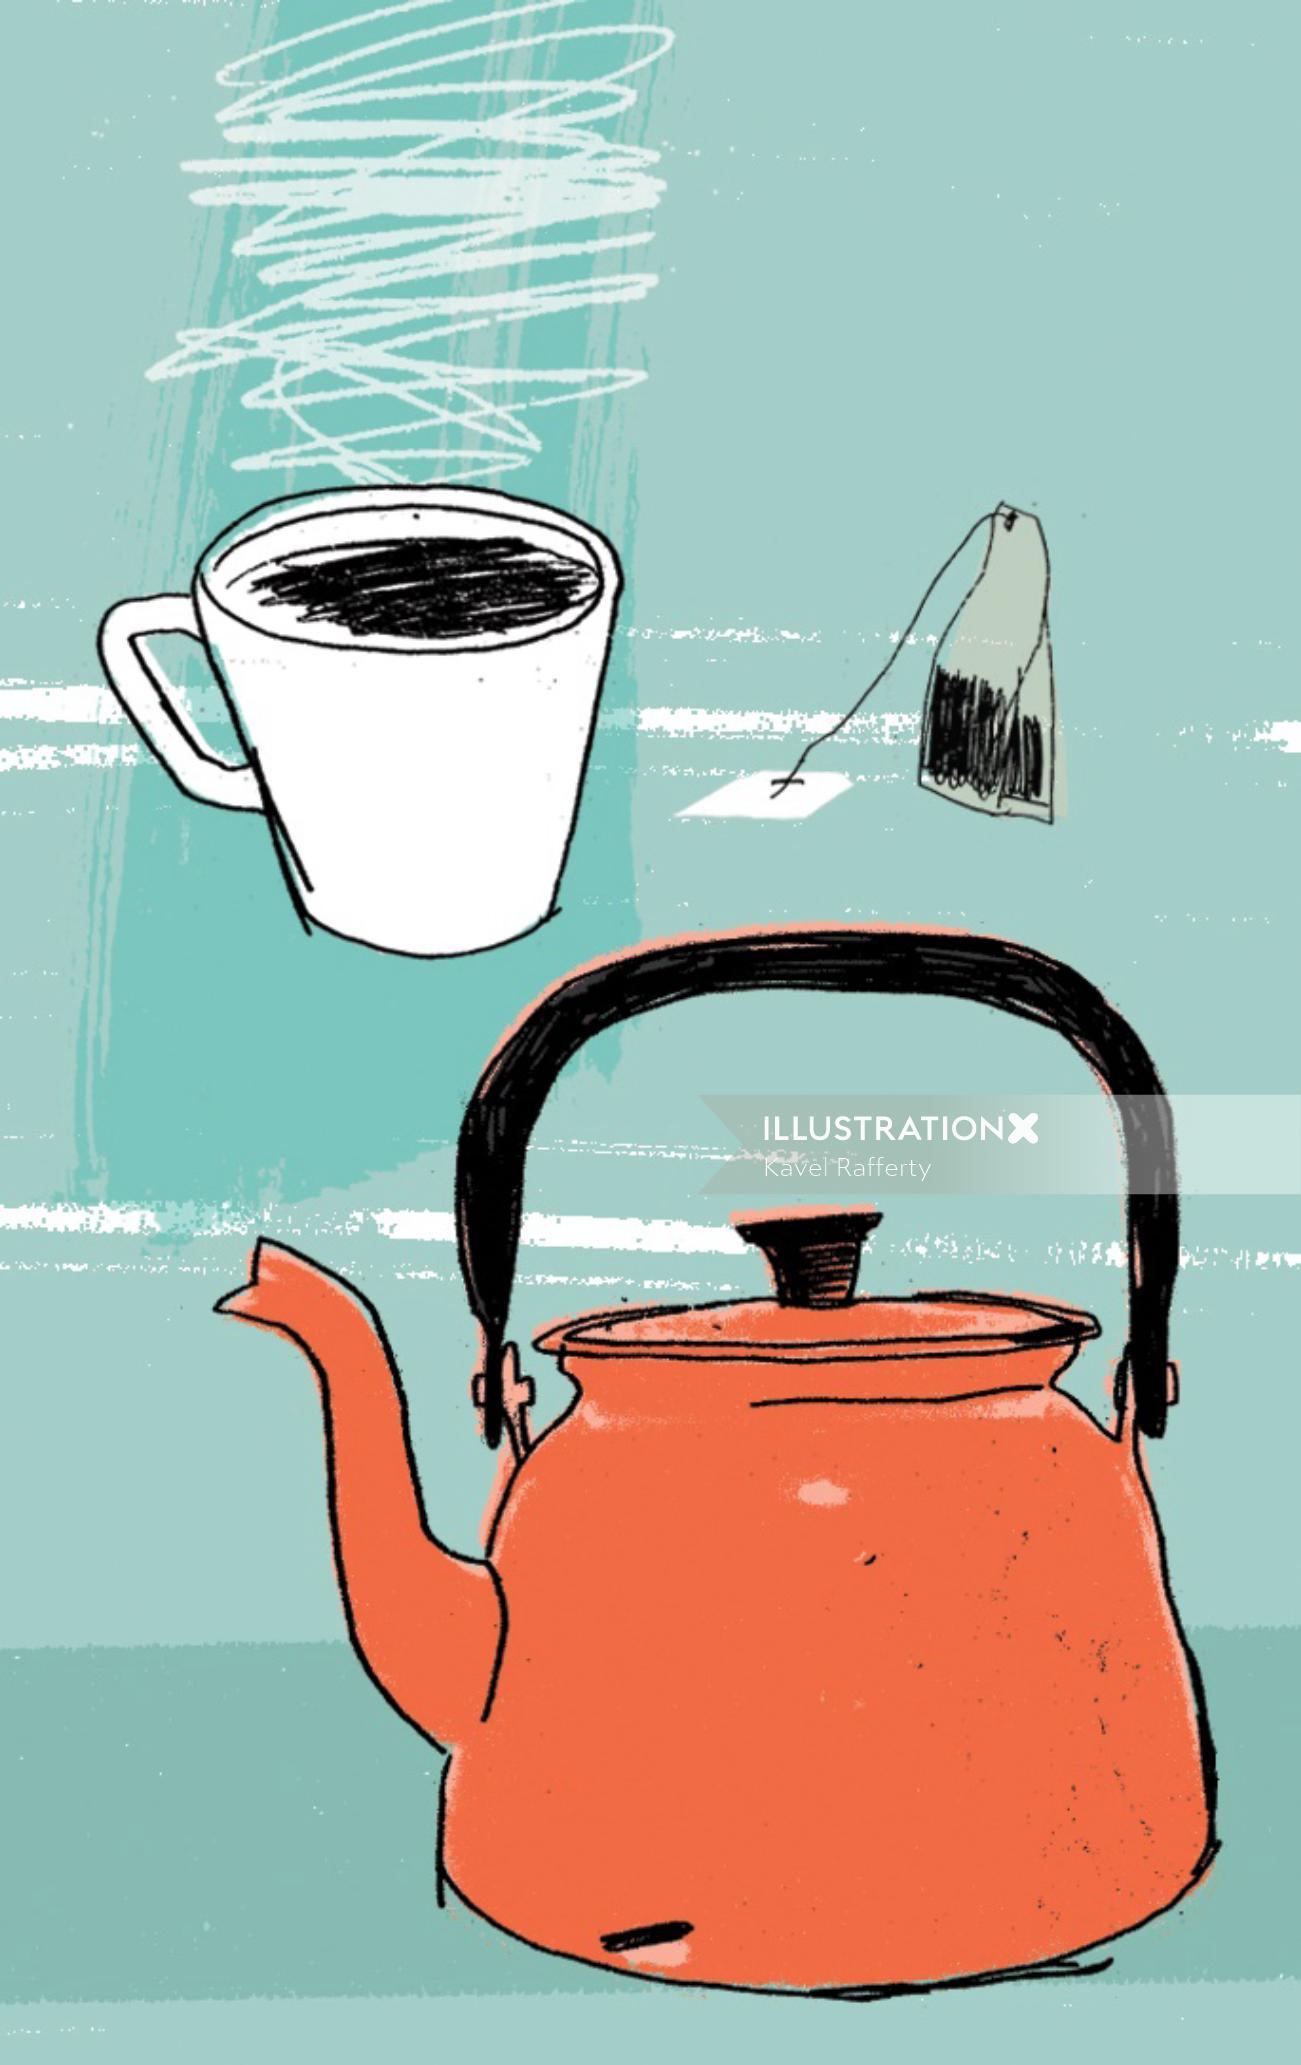 Sketch of teapot, teacup and teabag